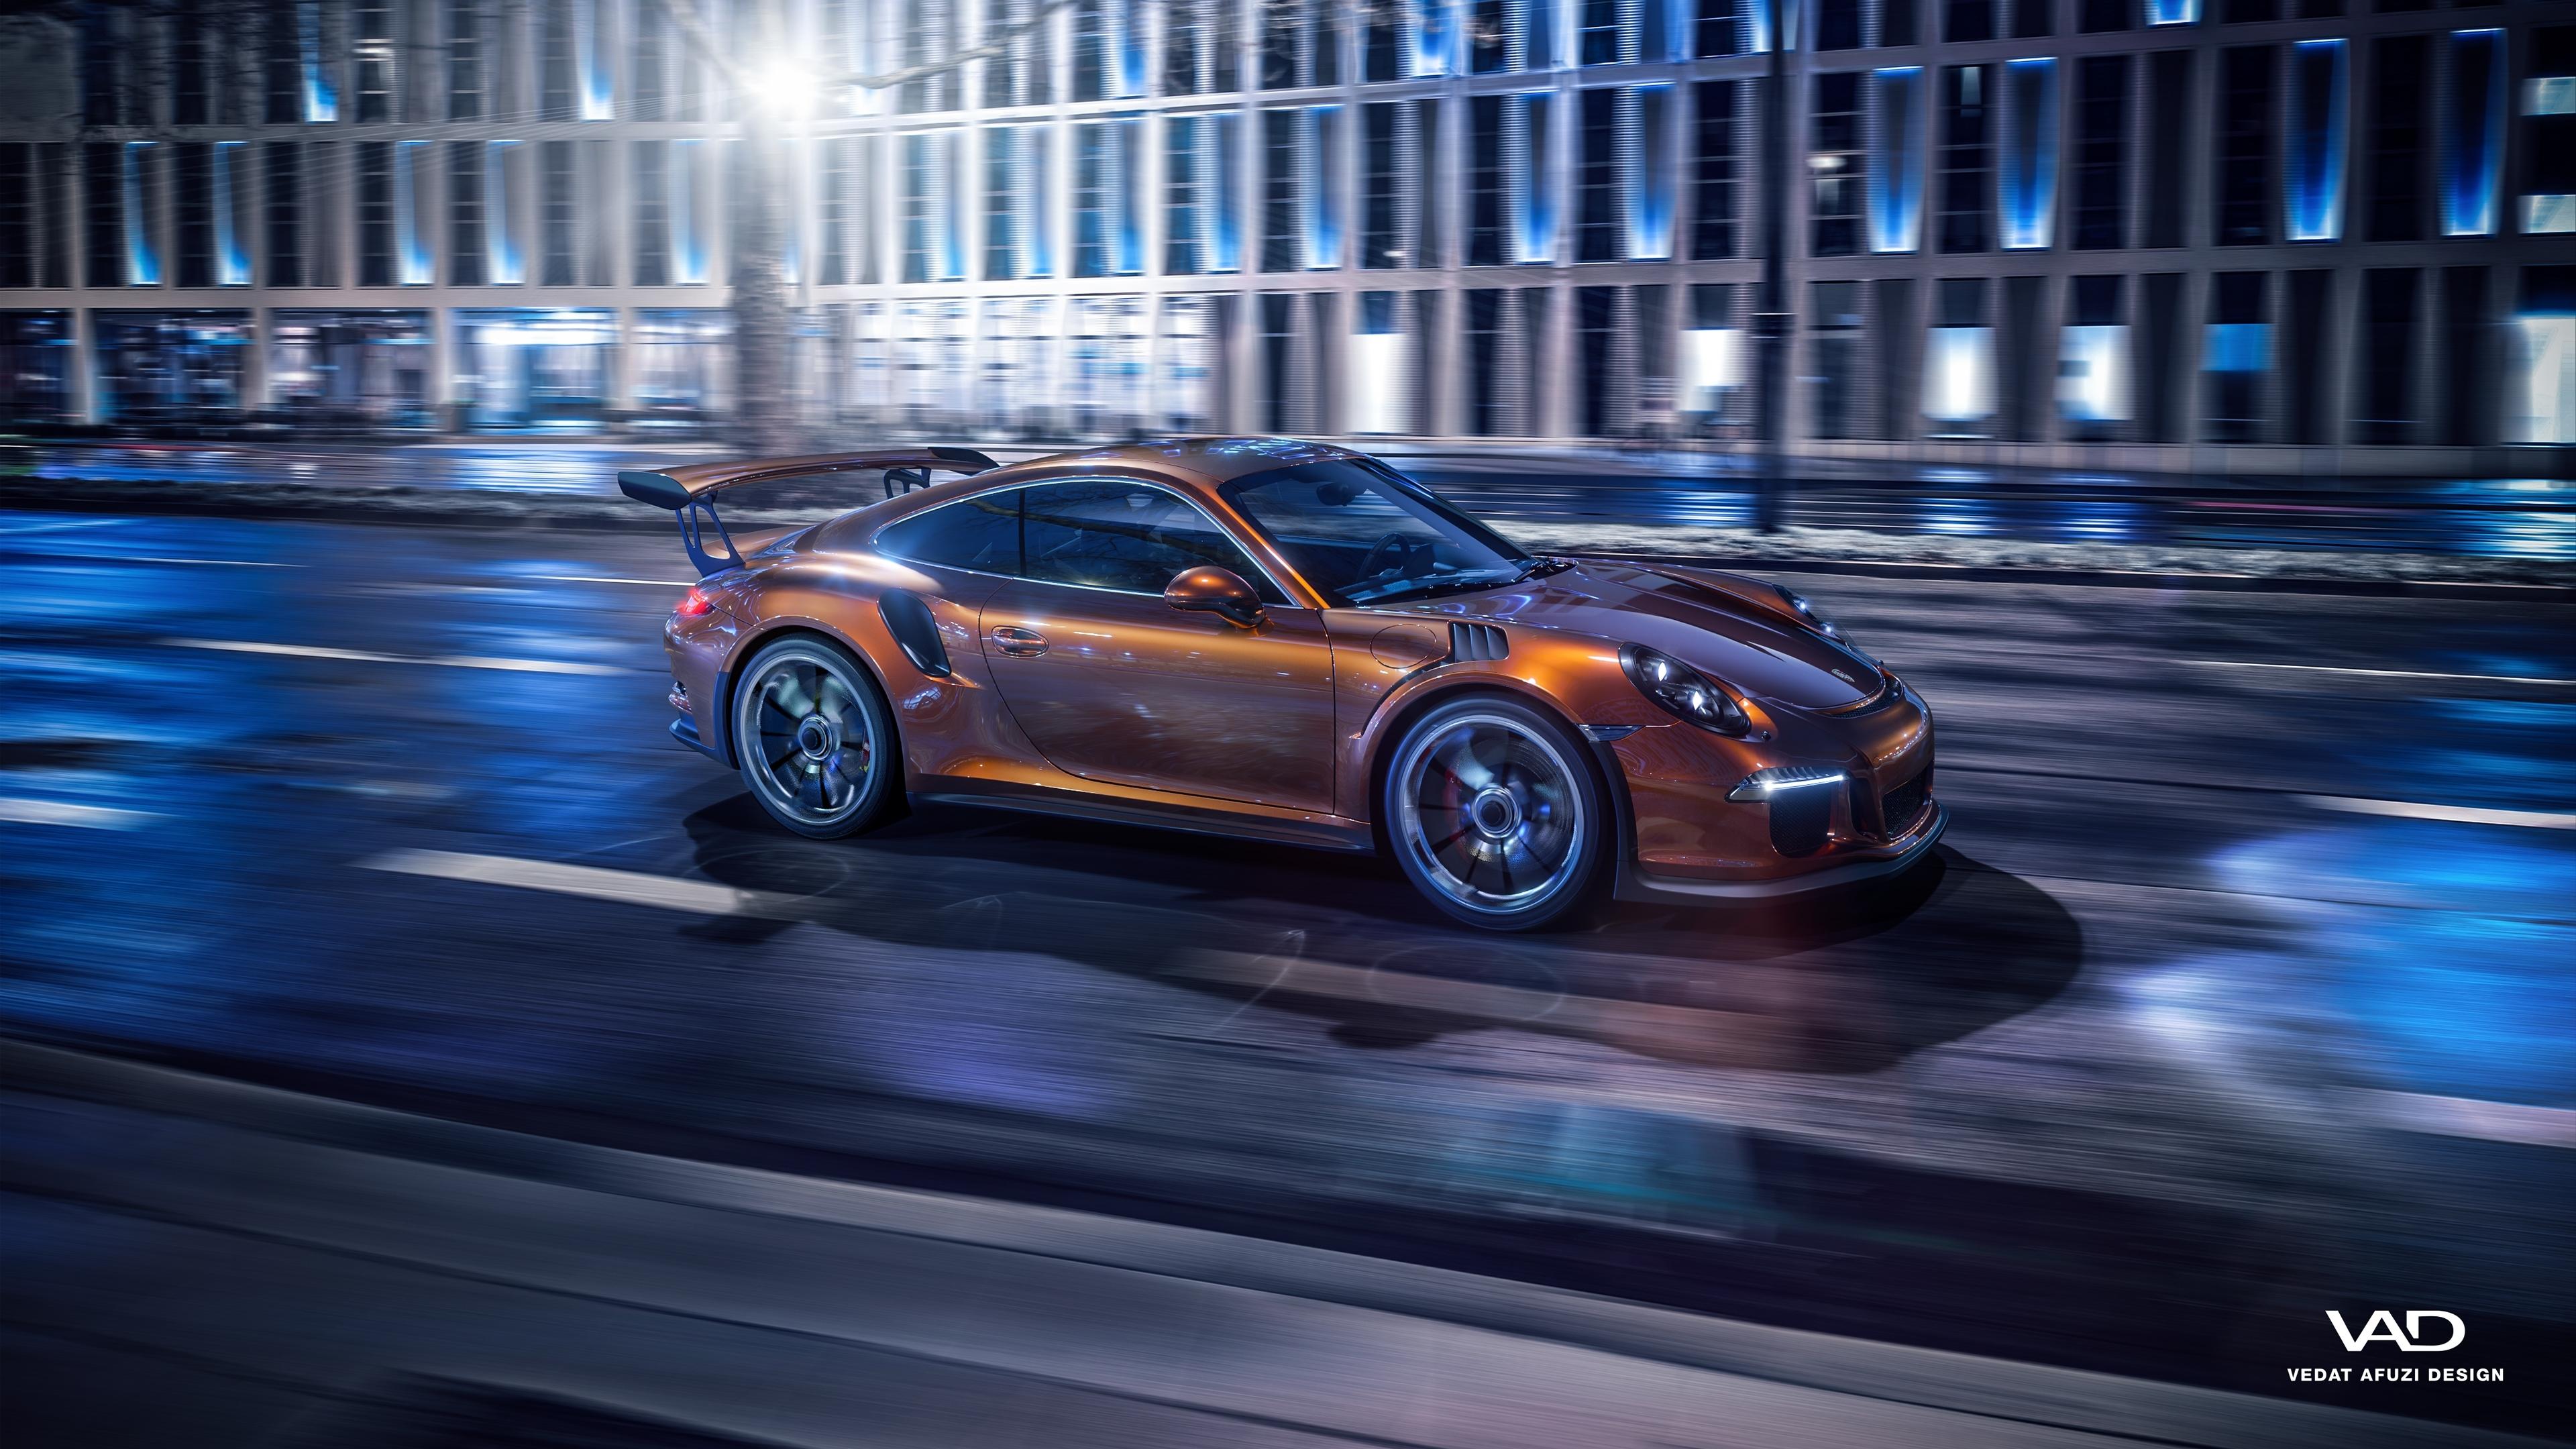 Title : porsche 911 gt3 rs 4k wallpaper | hd car wallpapers| id #8426. Dimension : 3840 x 2160. File Type : JPG/JPEG